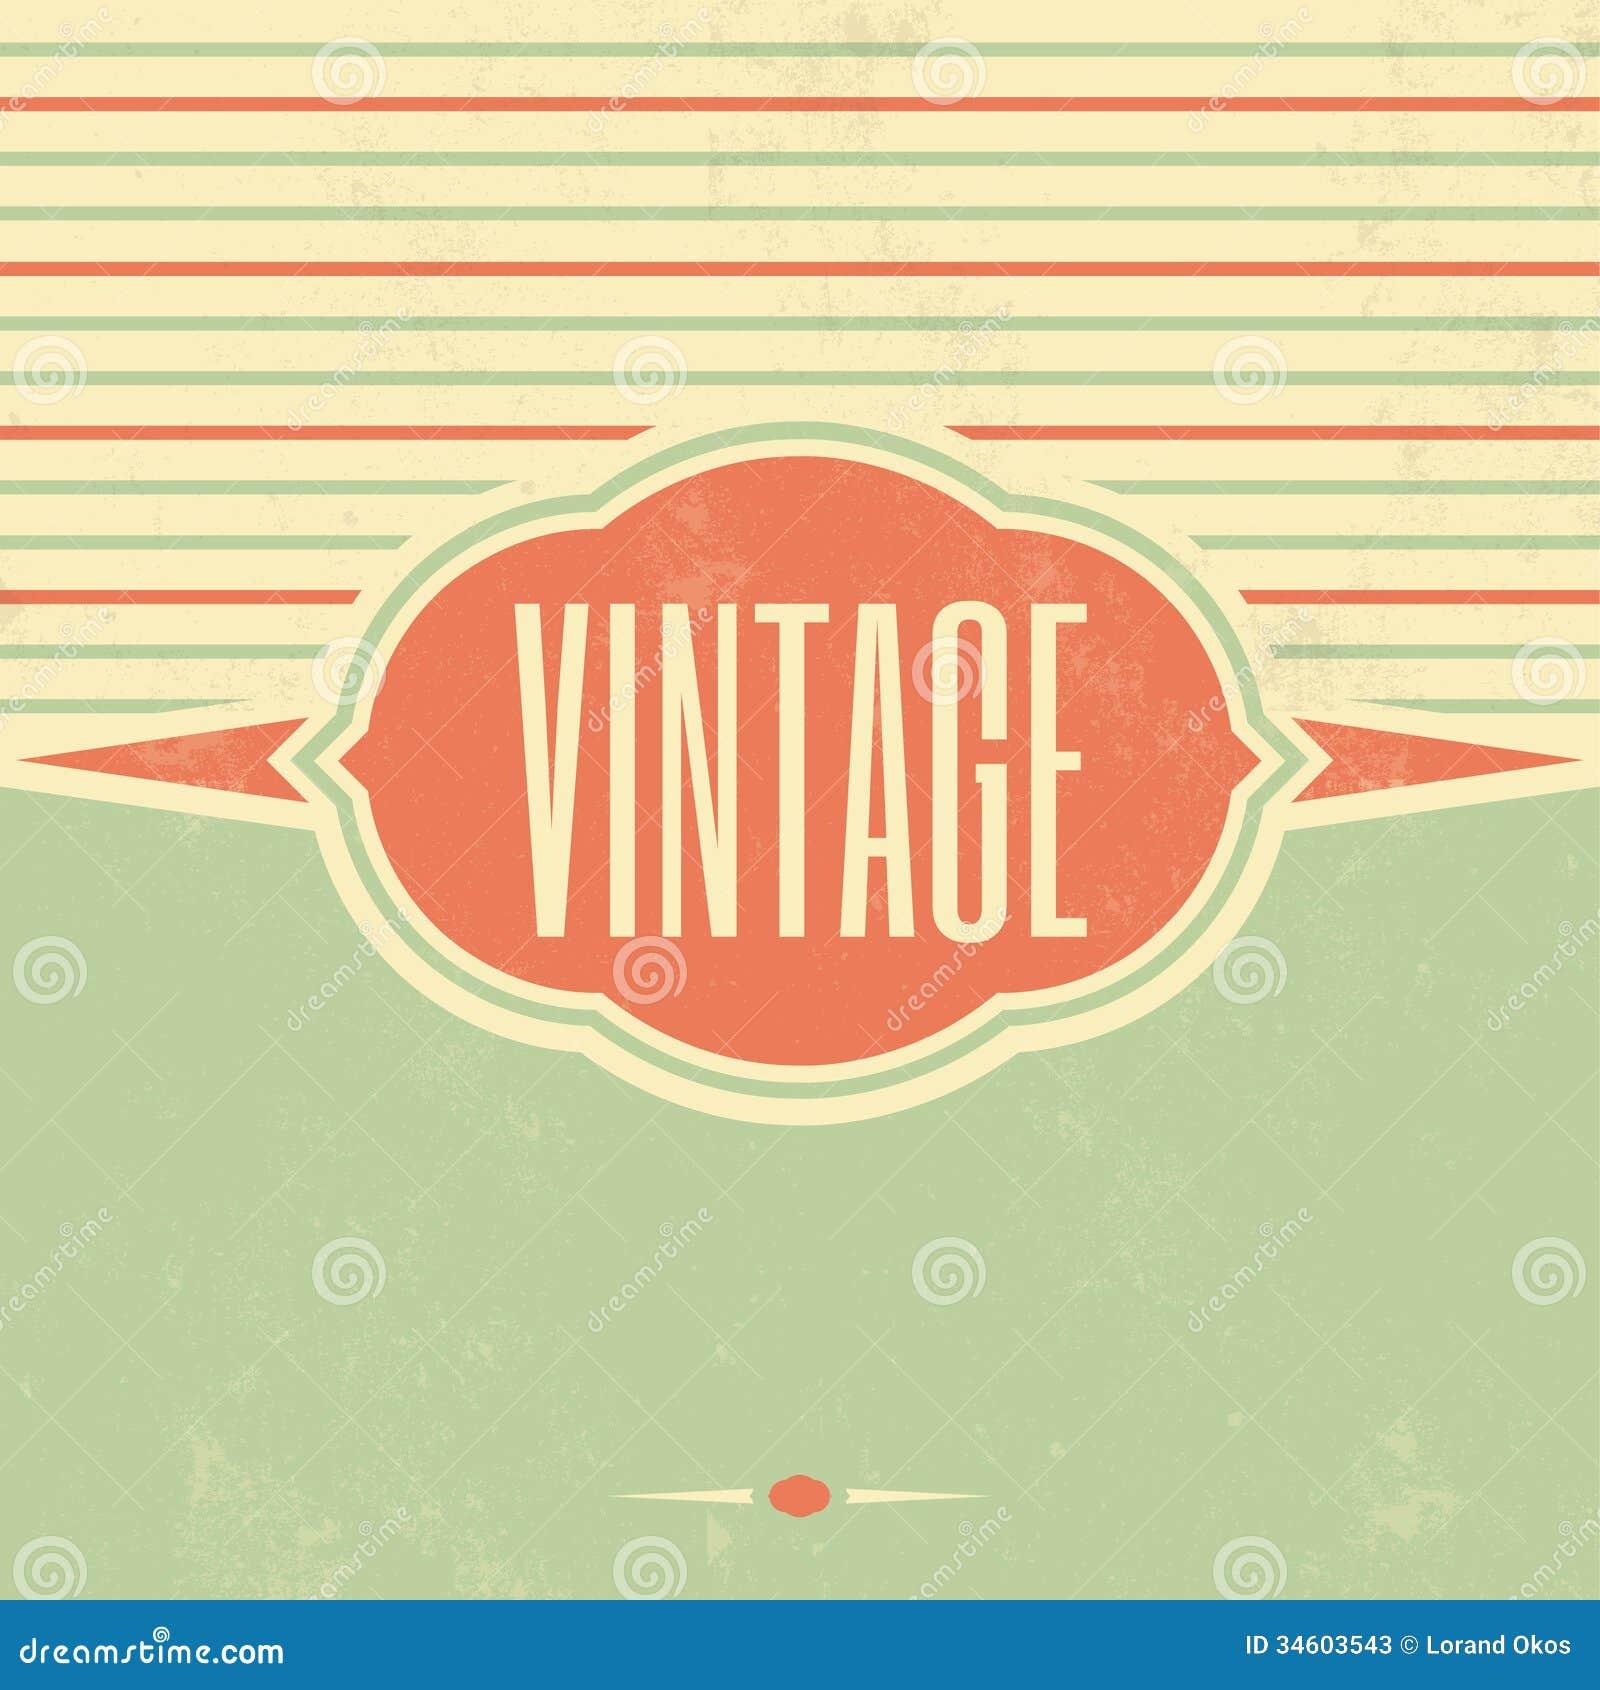 retro template design vintage background stock photos image 34603543. Black Bedroom Furniture Sets. Home Design Ideas